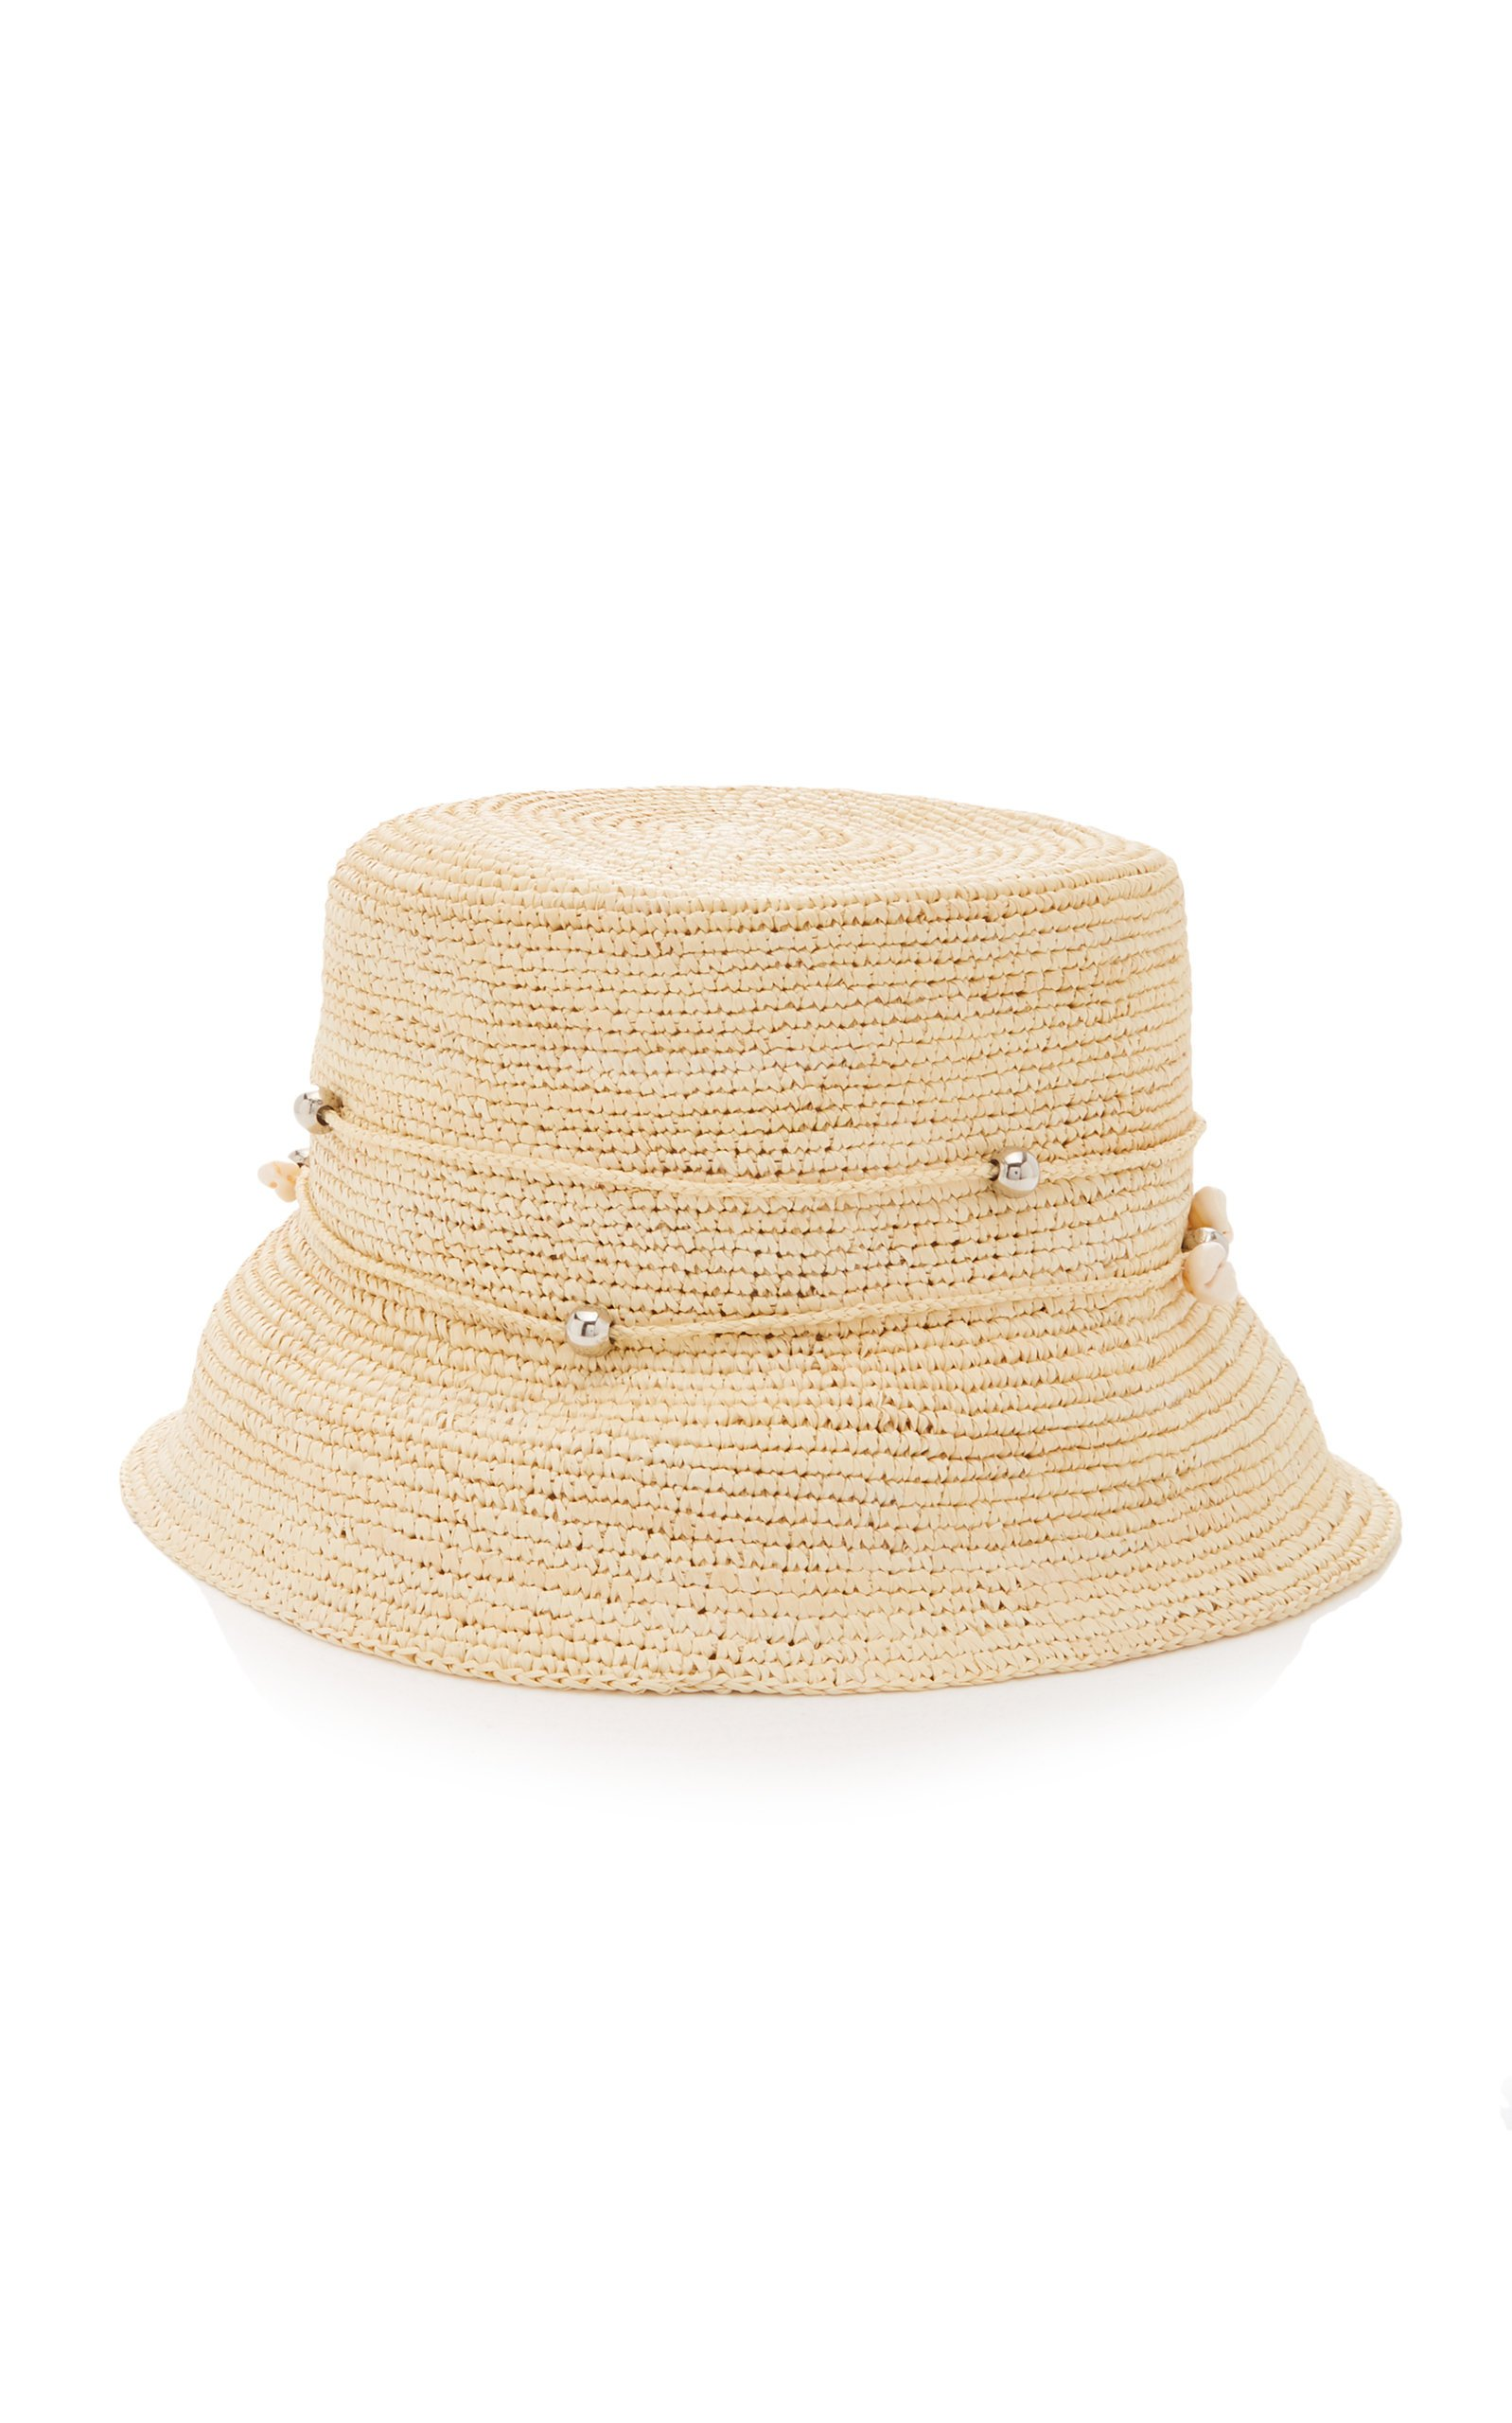 Sensi Studio Embellished Straw Bucket Hat Size: M